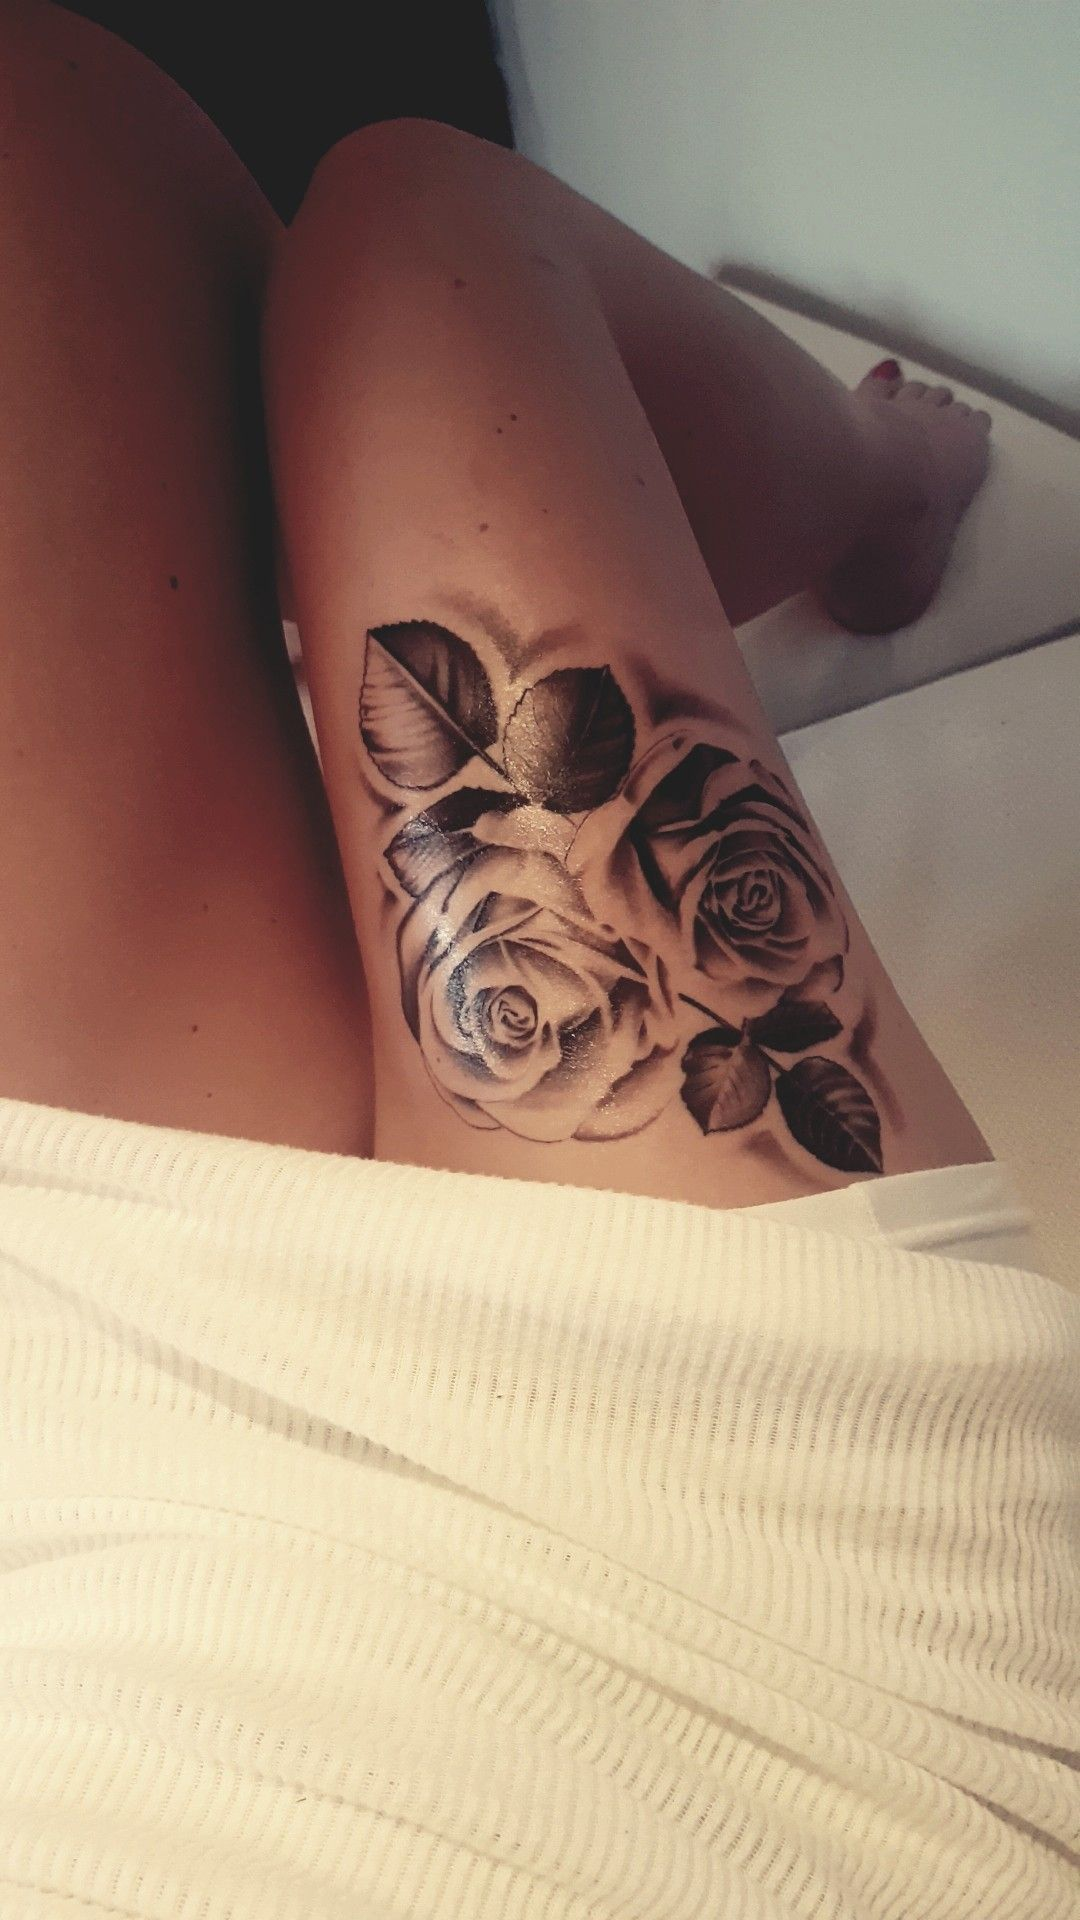 Roses Thigh Tattoo Leg Tattoos Women Rose Tattoo Thigh Leg Tattoos